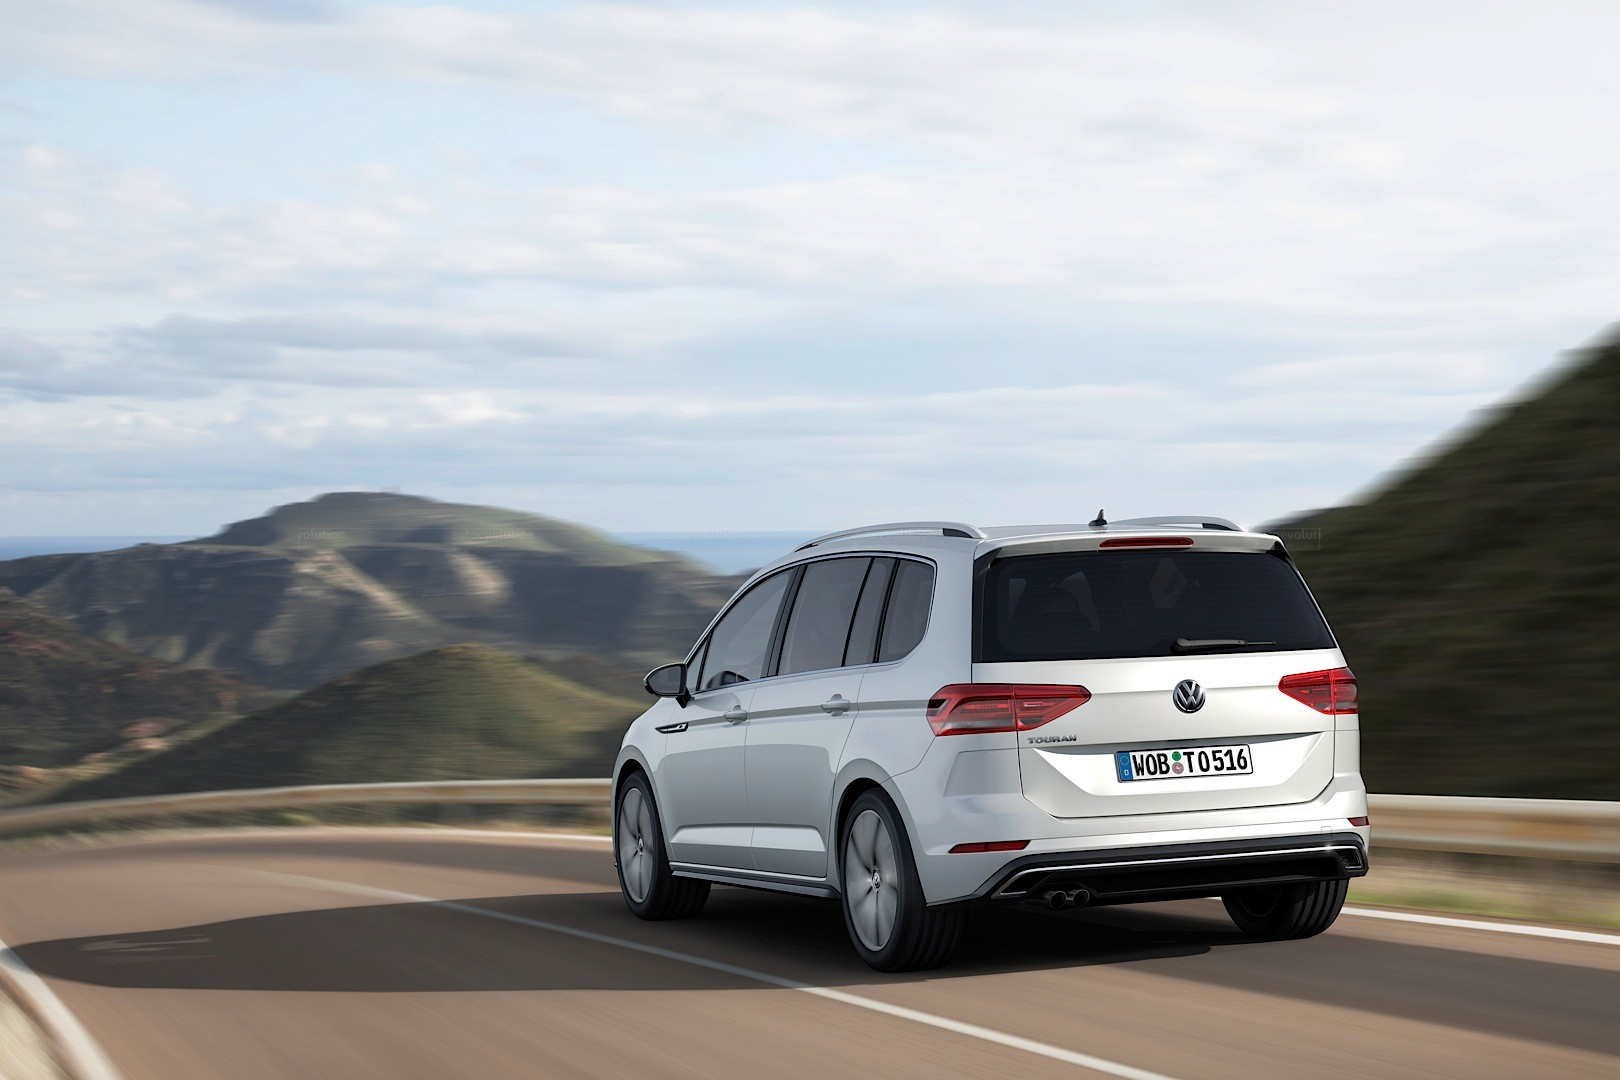 2016 Volkswagen Touran Gets 1.8 TSI 180 HP and 2.0 TDI 190 HP Engines - autoevolution